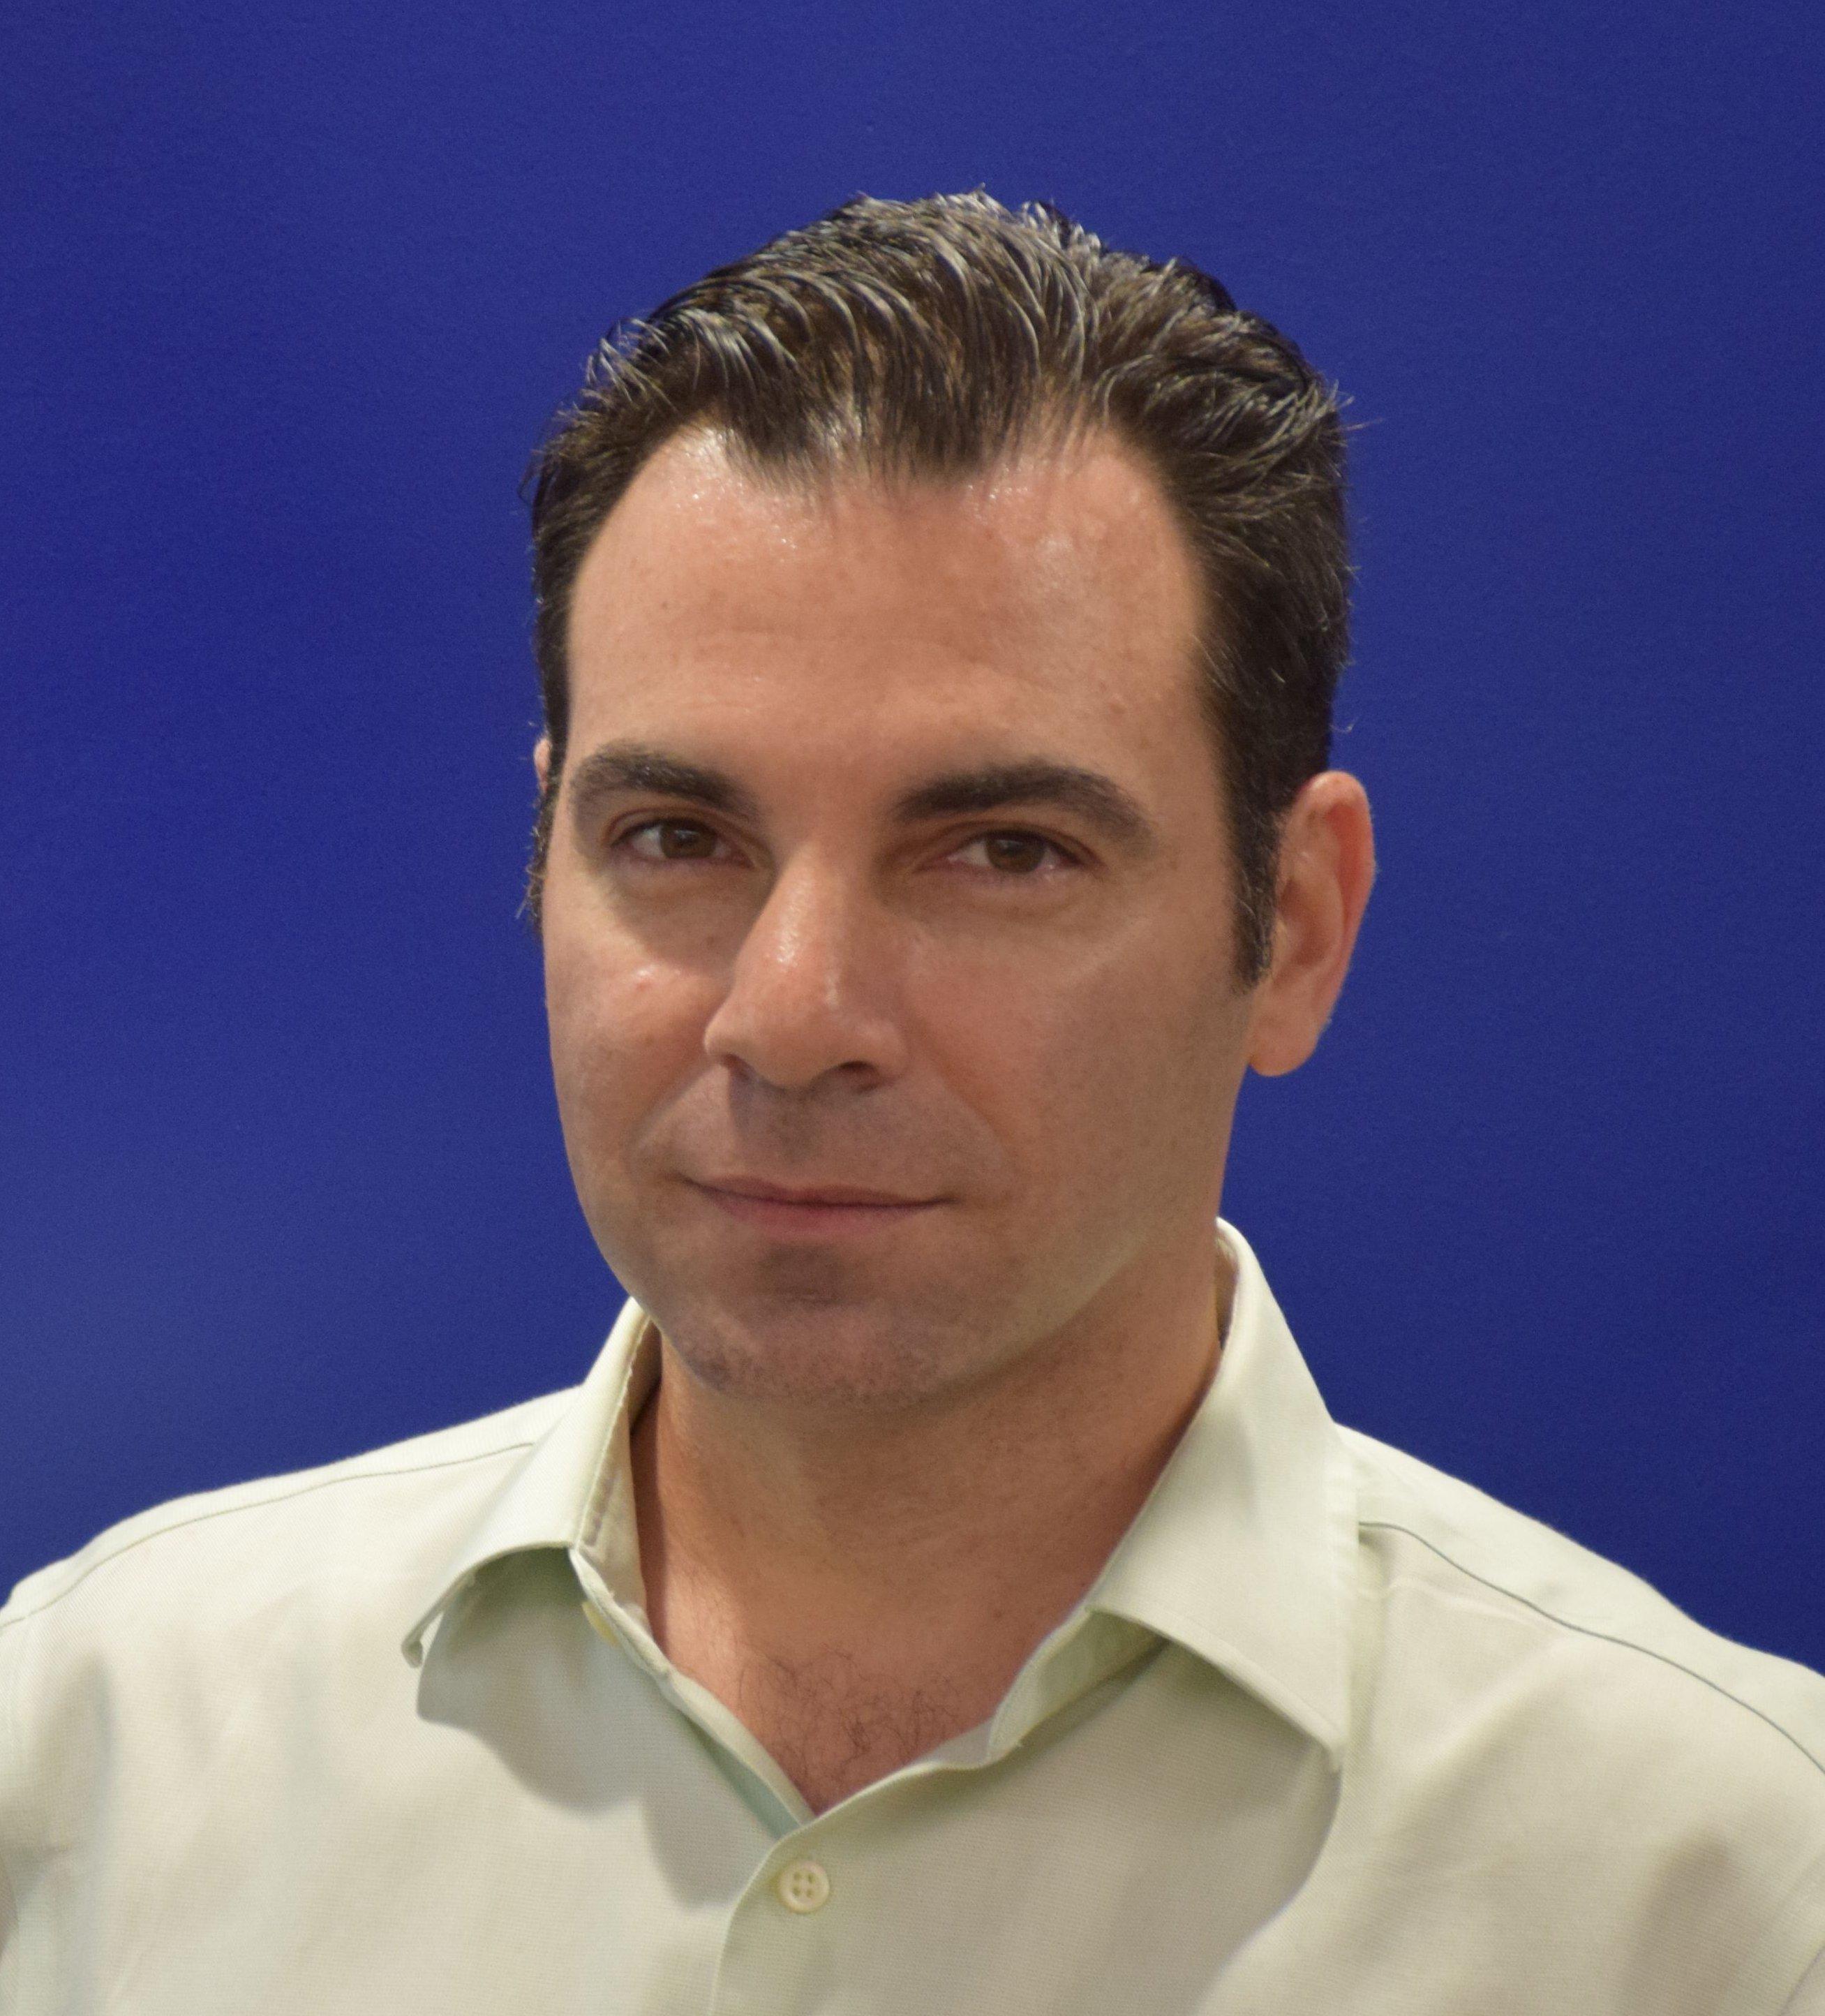 Andrew Ackerman, managing director of Dreamit New York